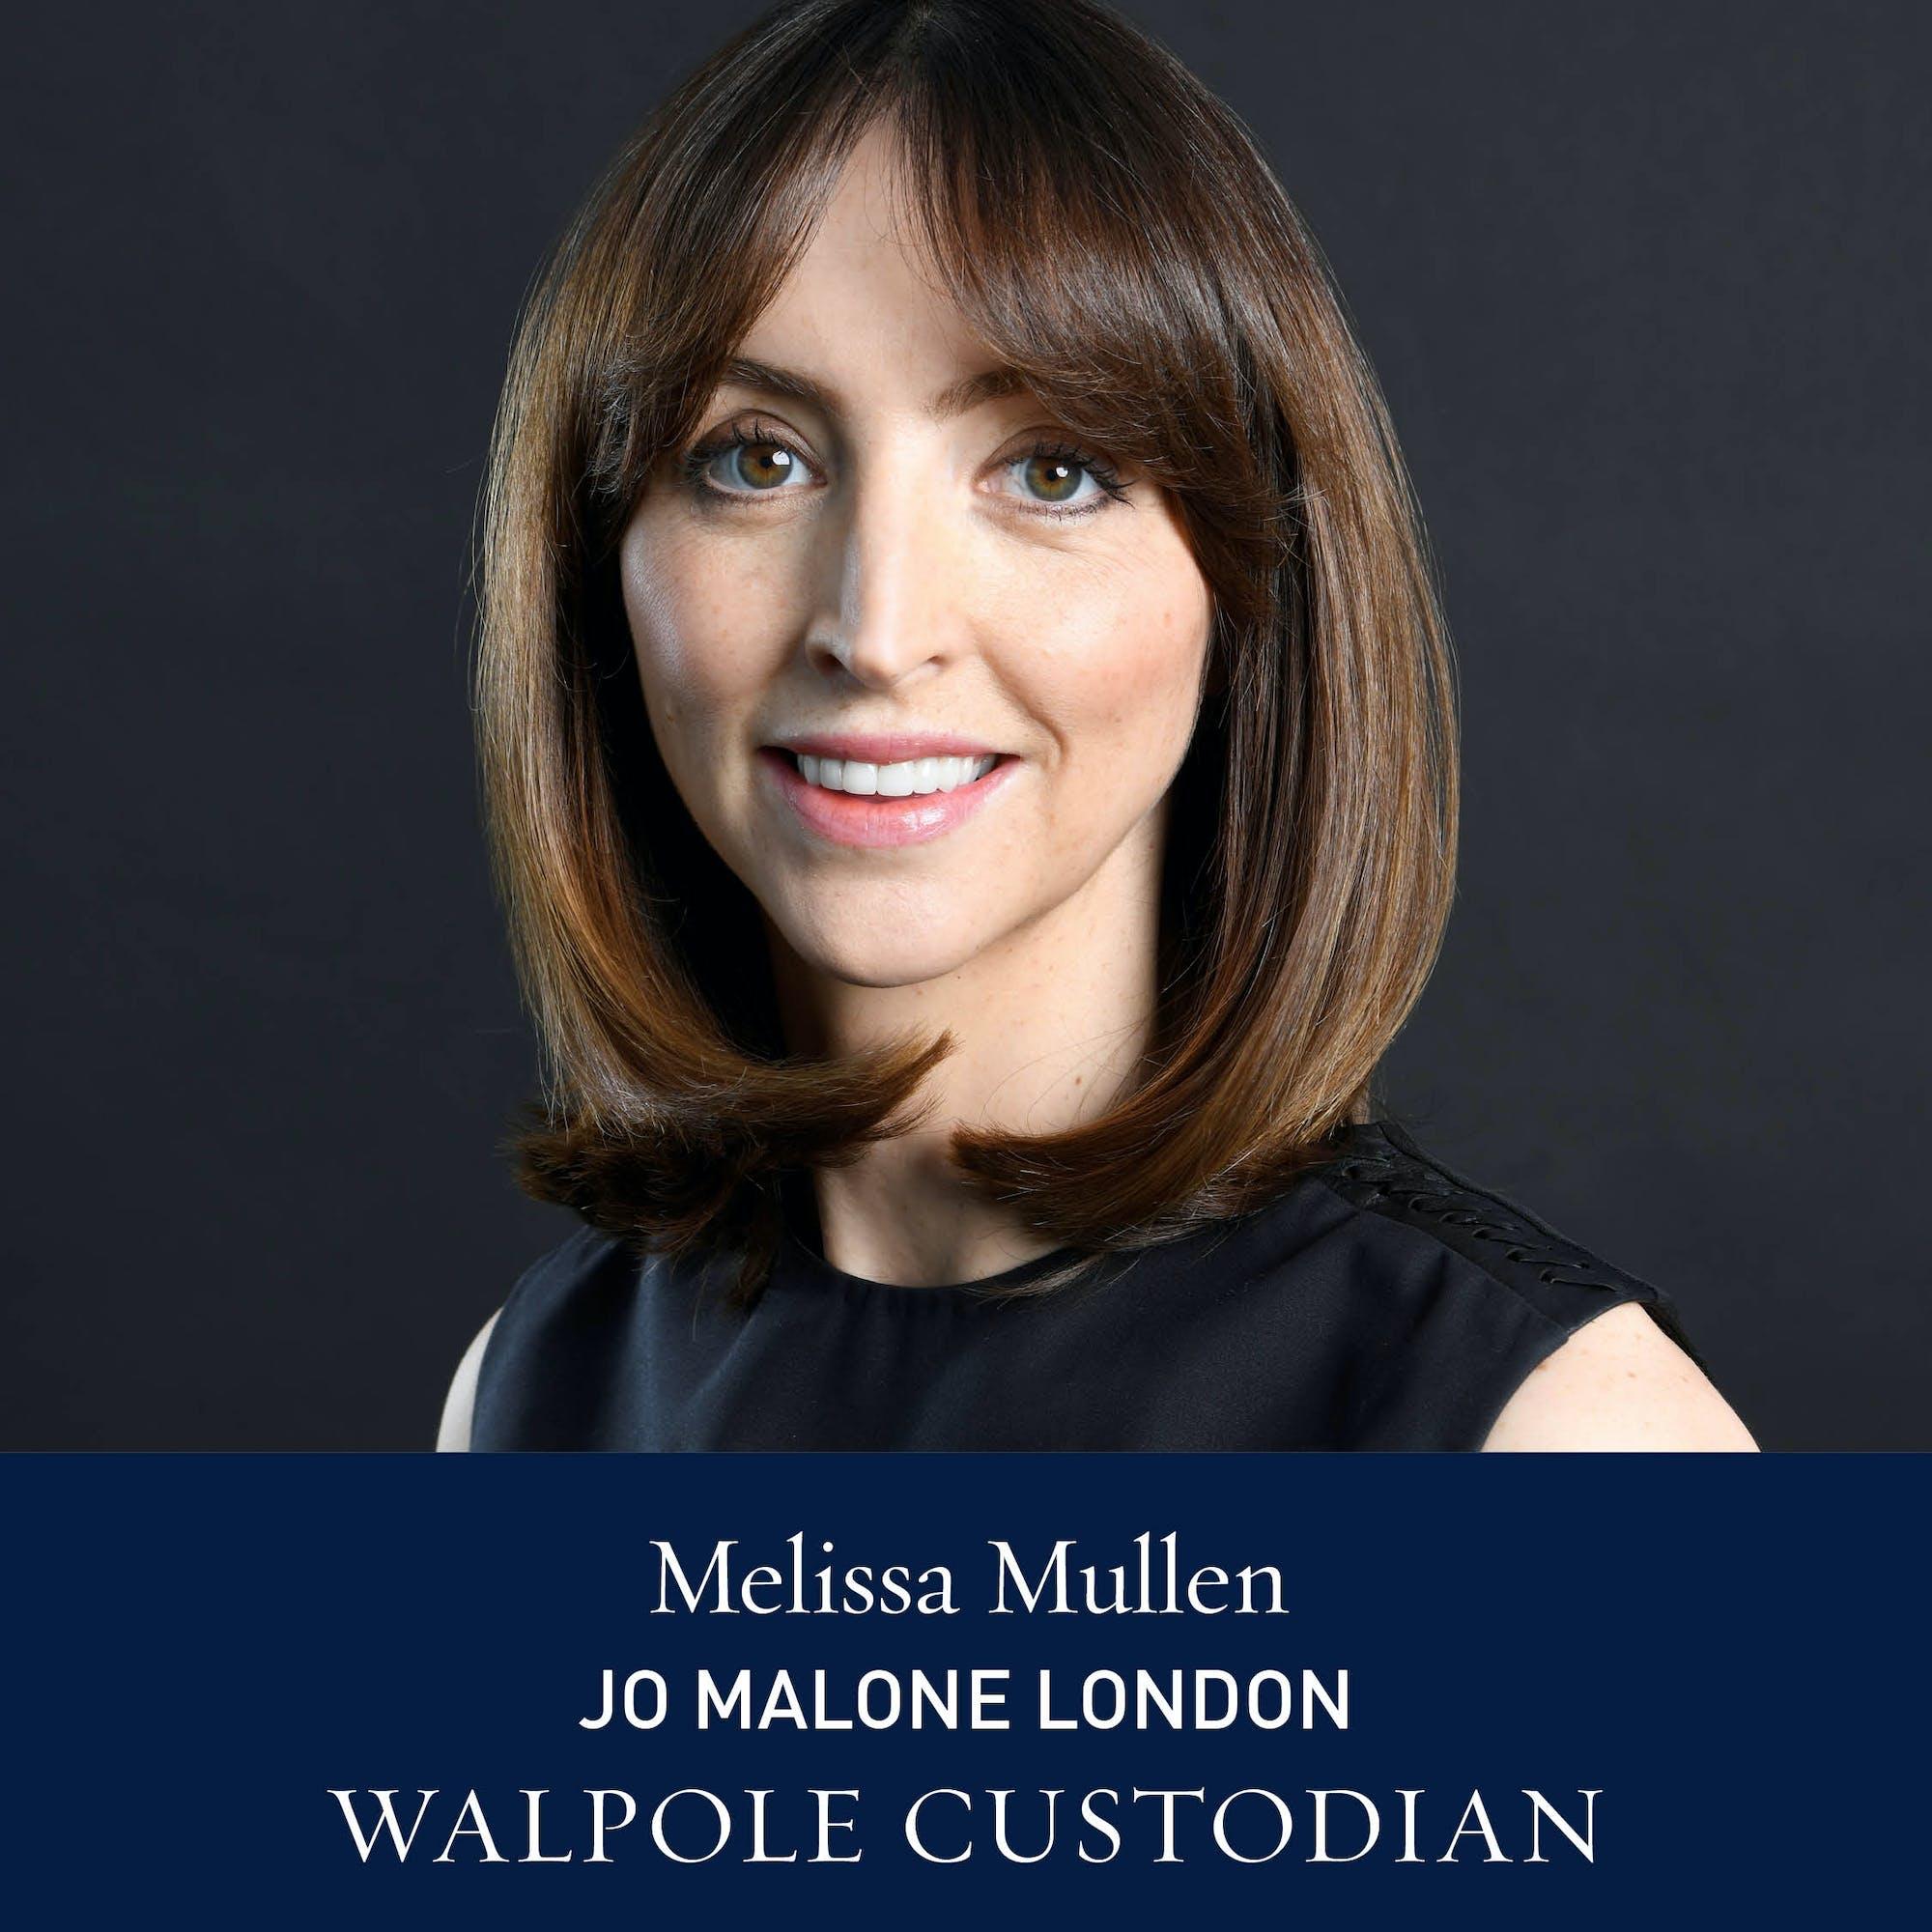 The Walpole Power List 2020  The Custodians: Melissa Mullen,Vice President, General Manager UK & IR, Jo Malone London